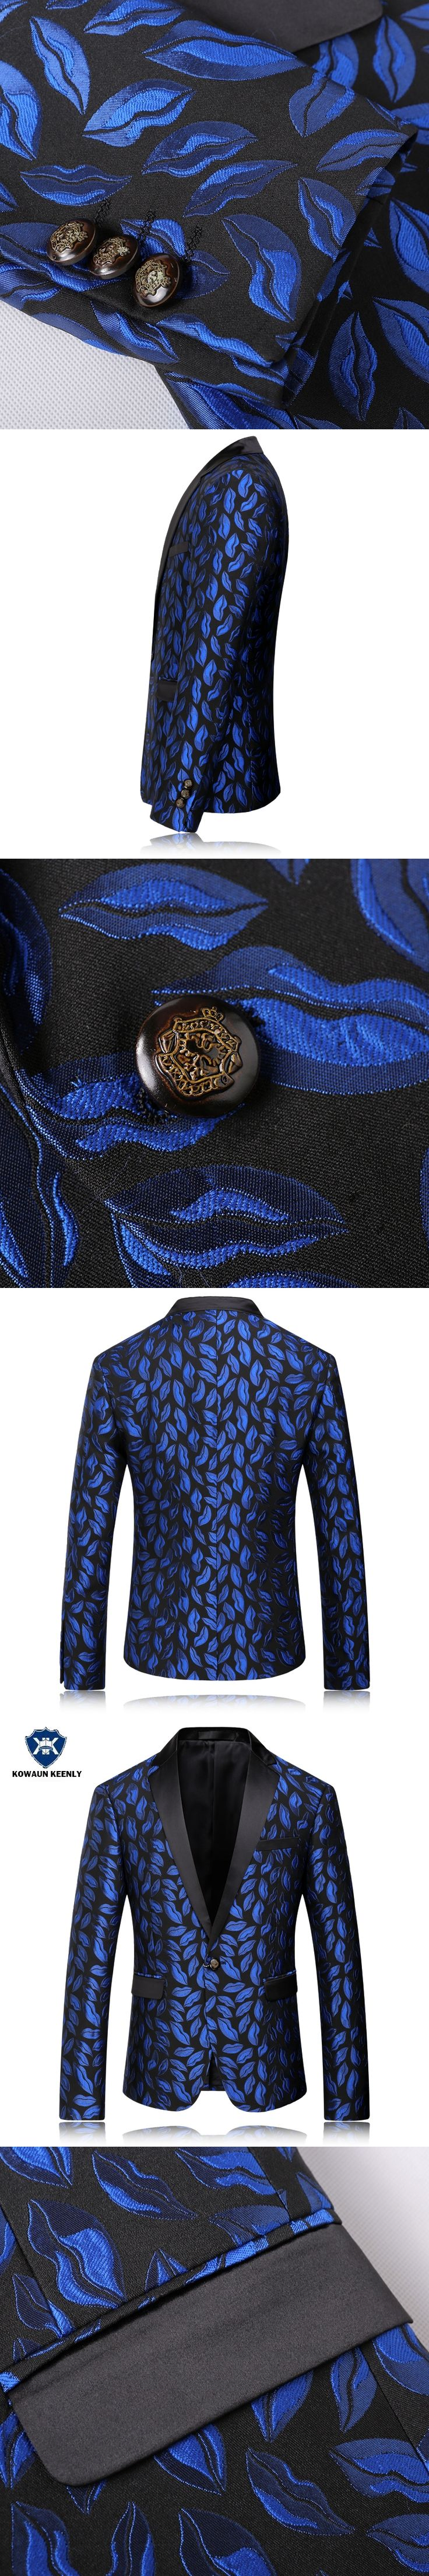 Mens Royal Blue Blazer Pattern Slim Fit Blazers Men Suit Jacket Stage Costumes For Singer Party Floral Blazer Vintage Party Wear